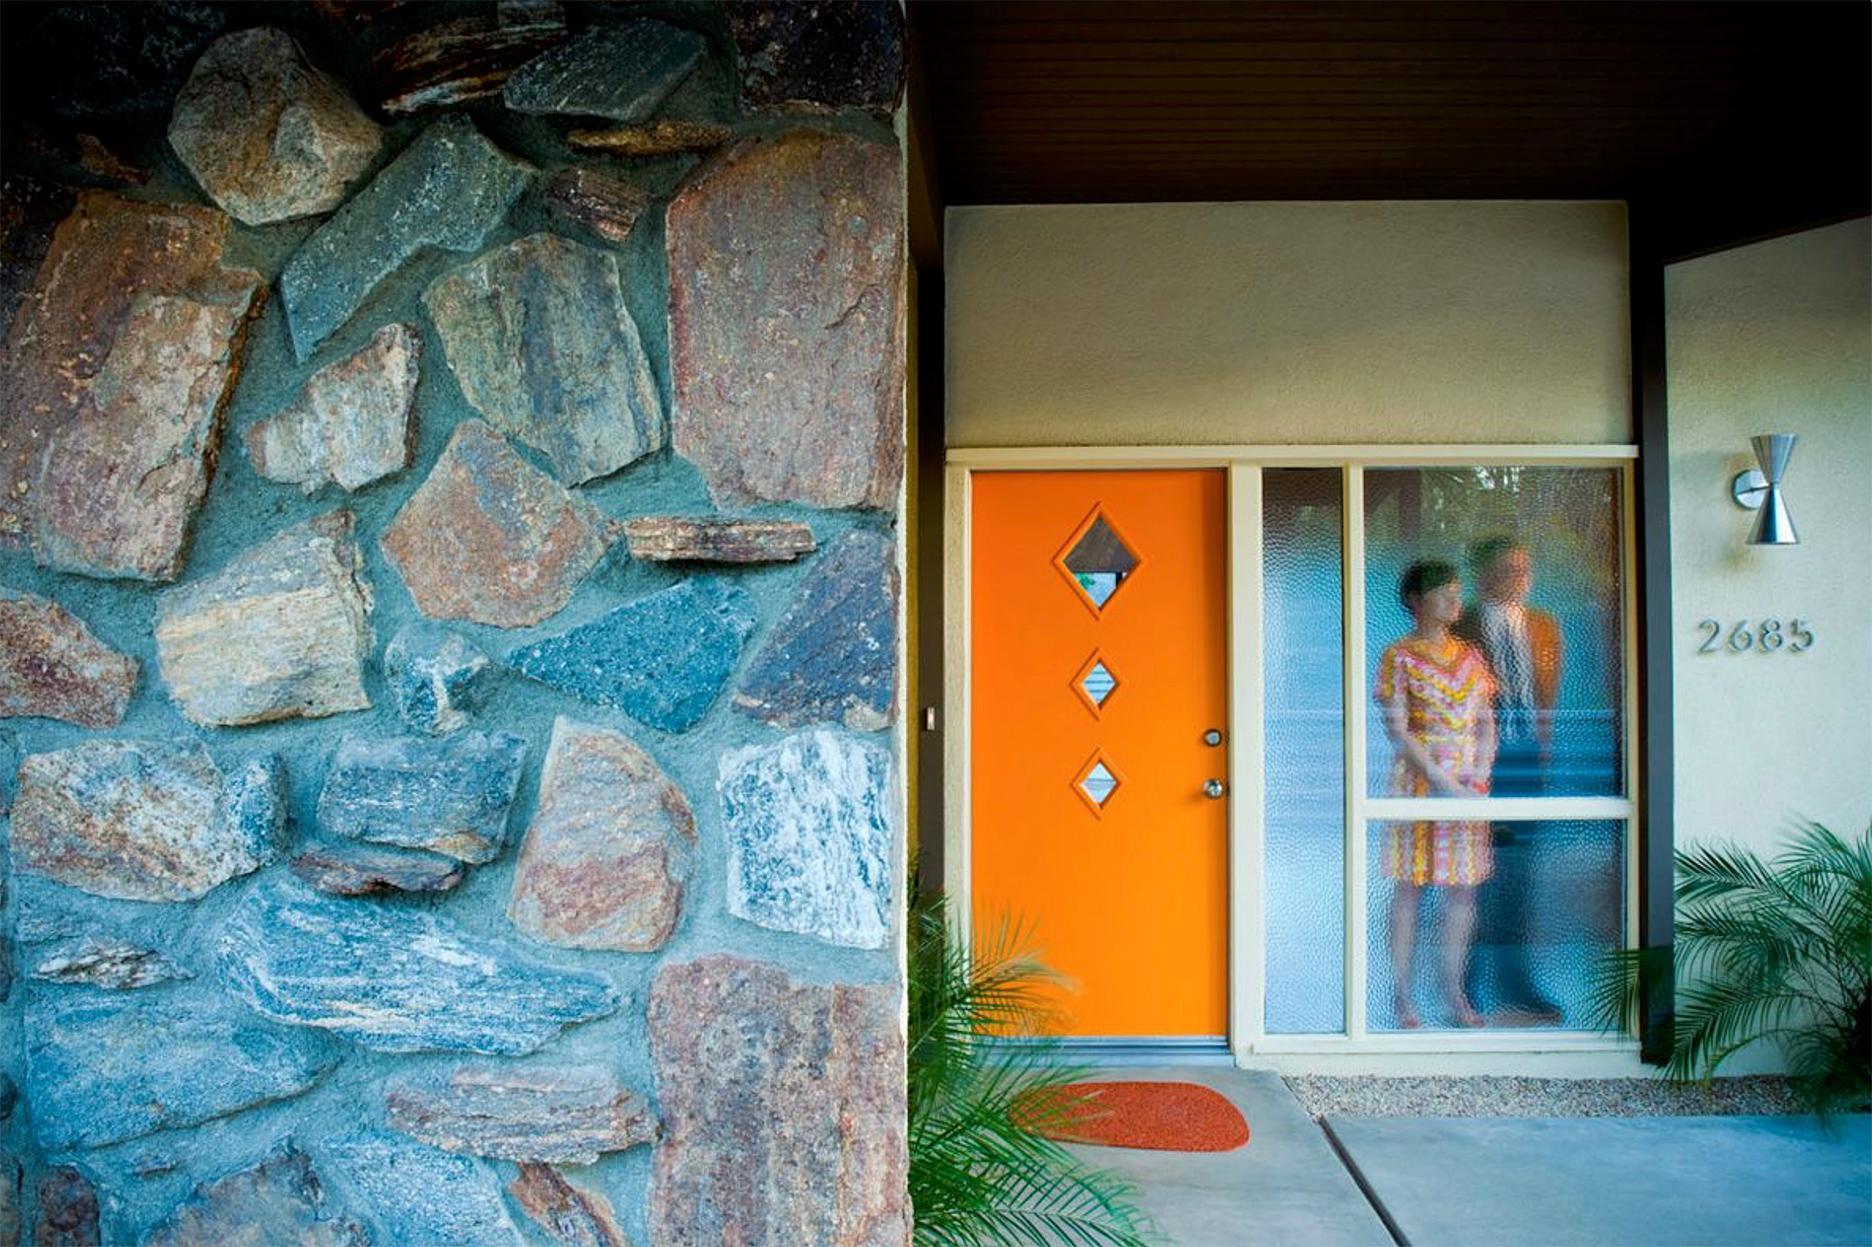 """Modernist Couple Behind Window"" James Schnepf Modernism Photograph Palm Springs"